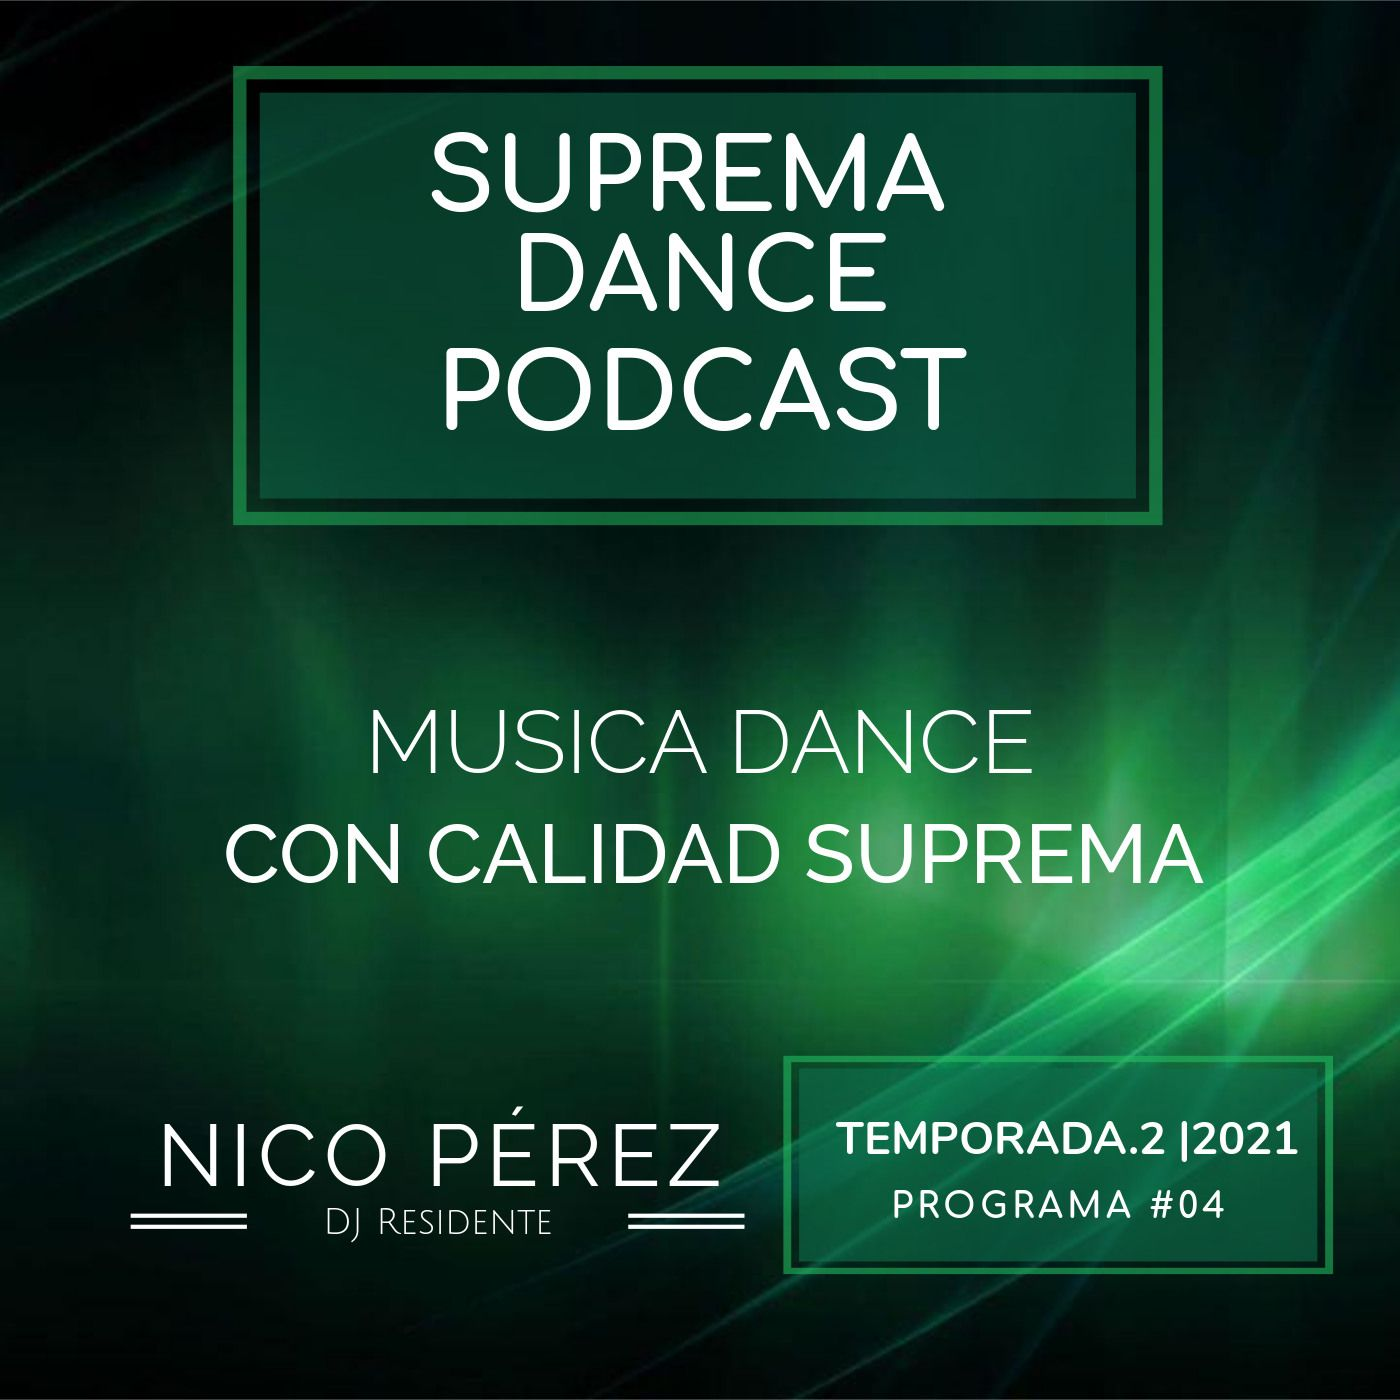 DJ Residente Nico Pérez | Programa-4 | T.2 | SDP